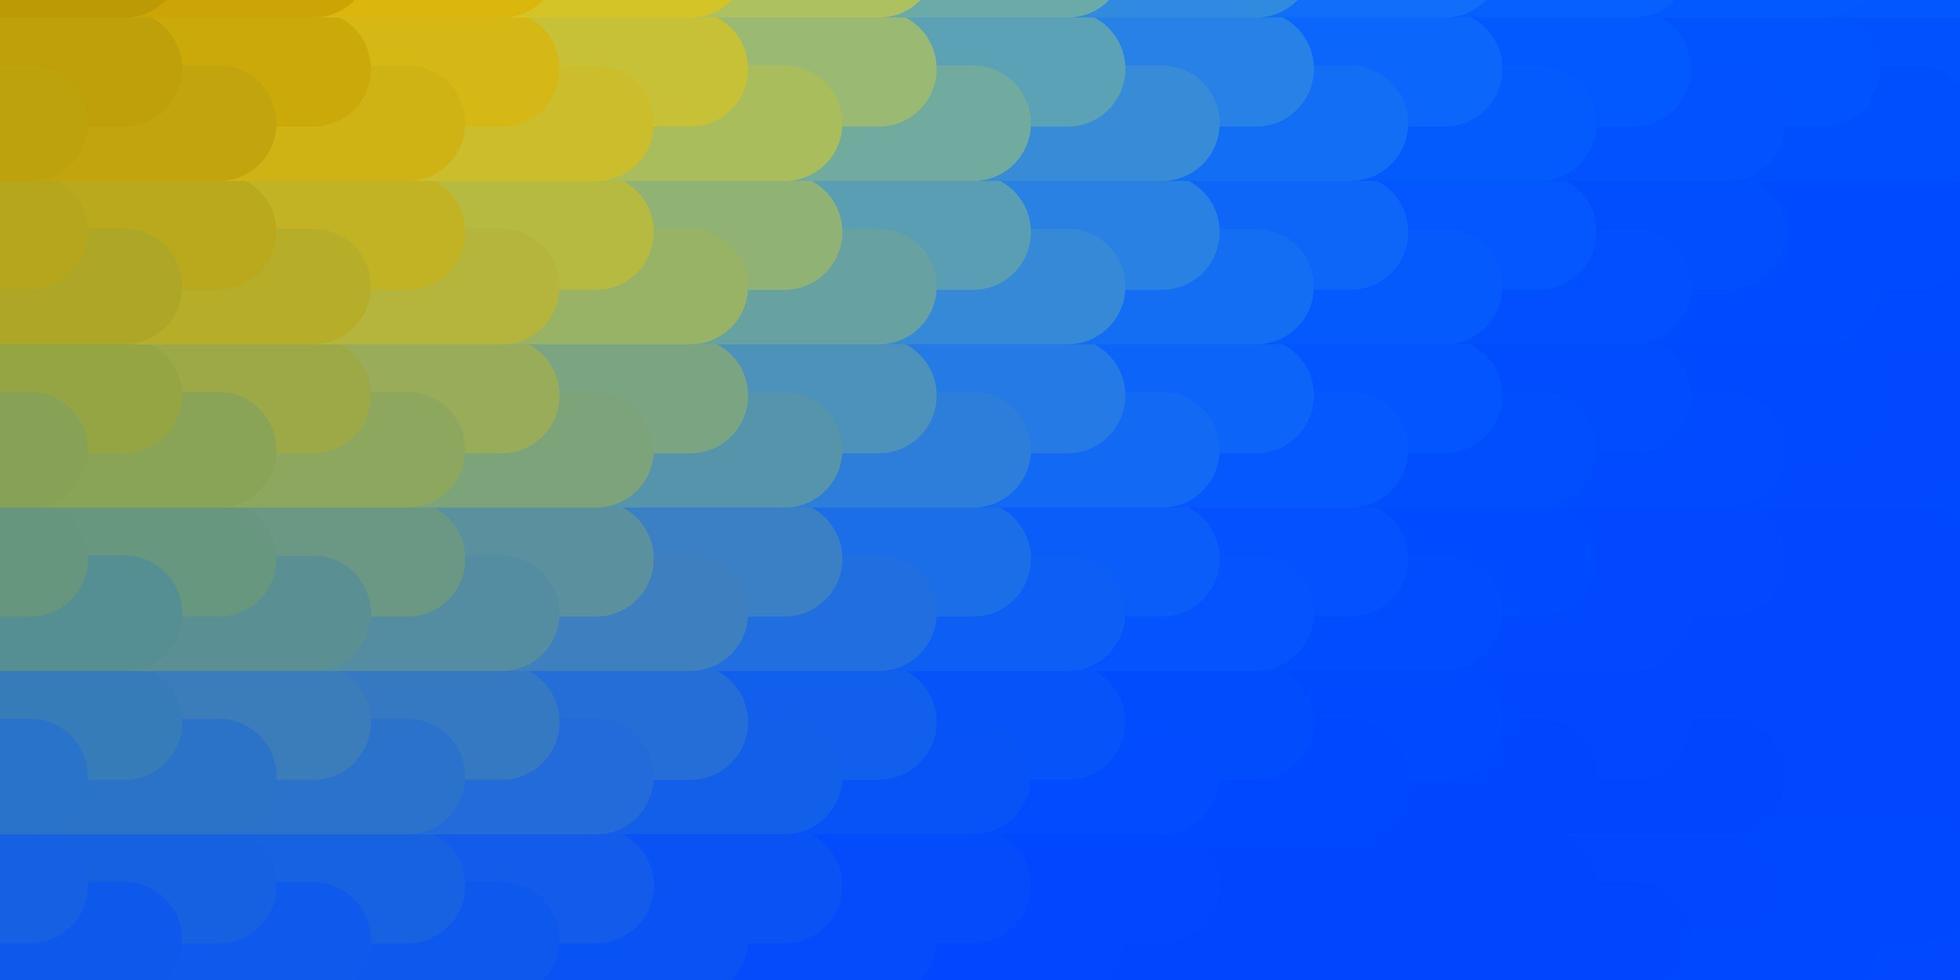 hellblaue, gelbe Textur mit Linien. vektor